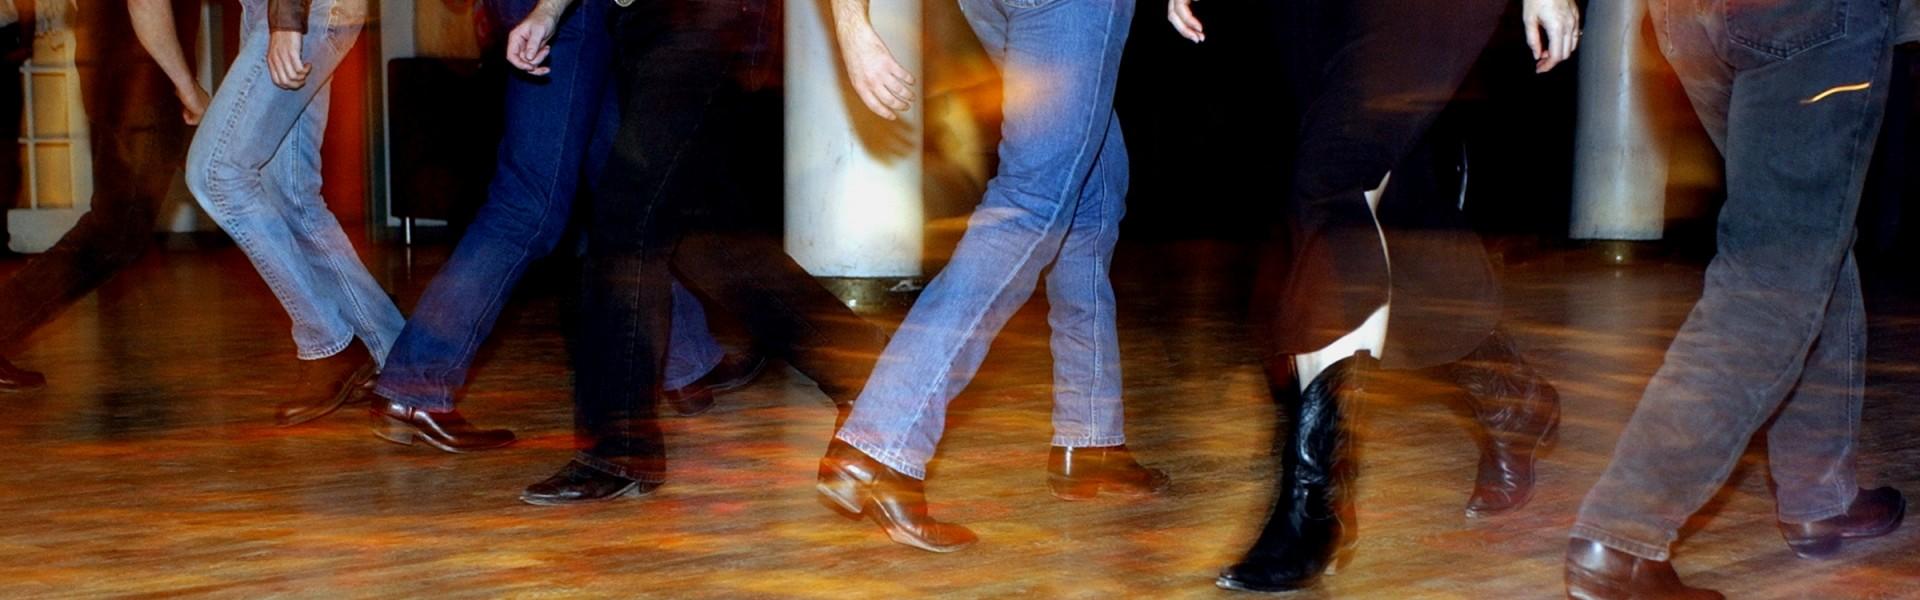 Country-line dansen